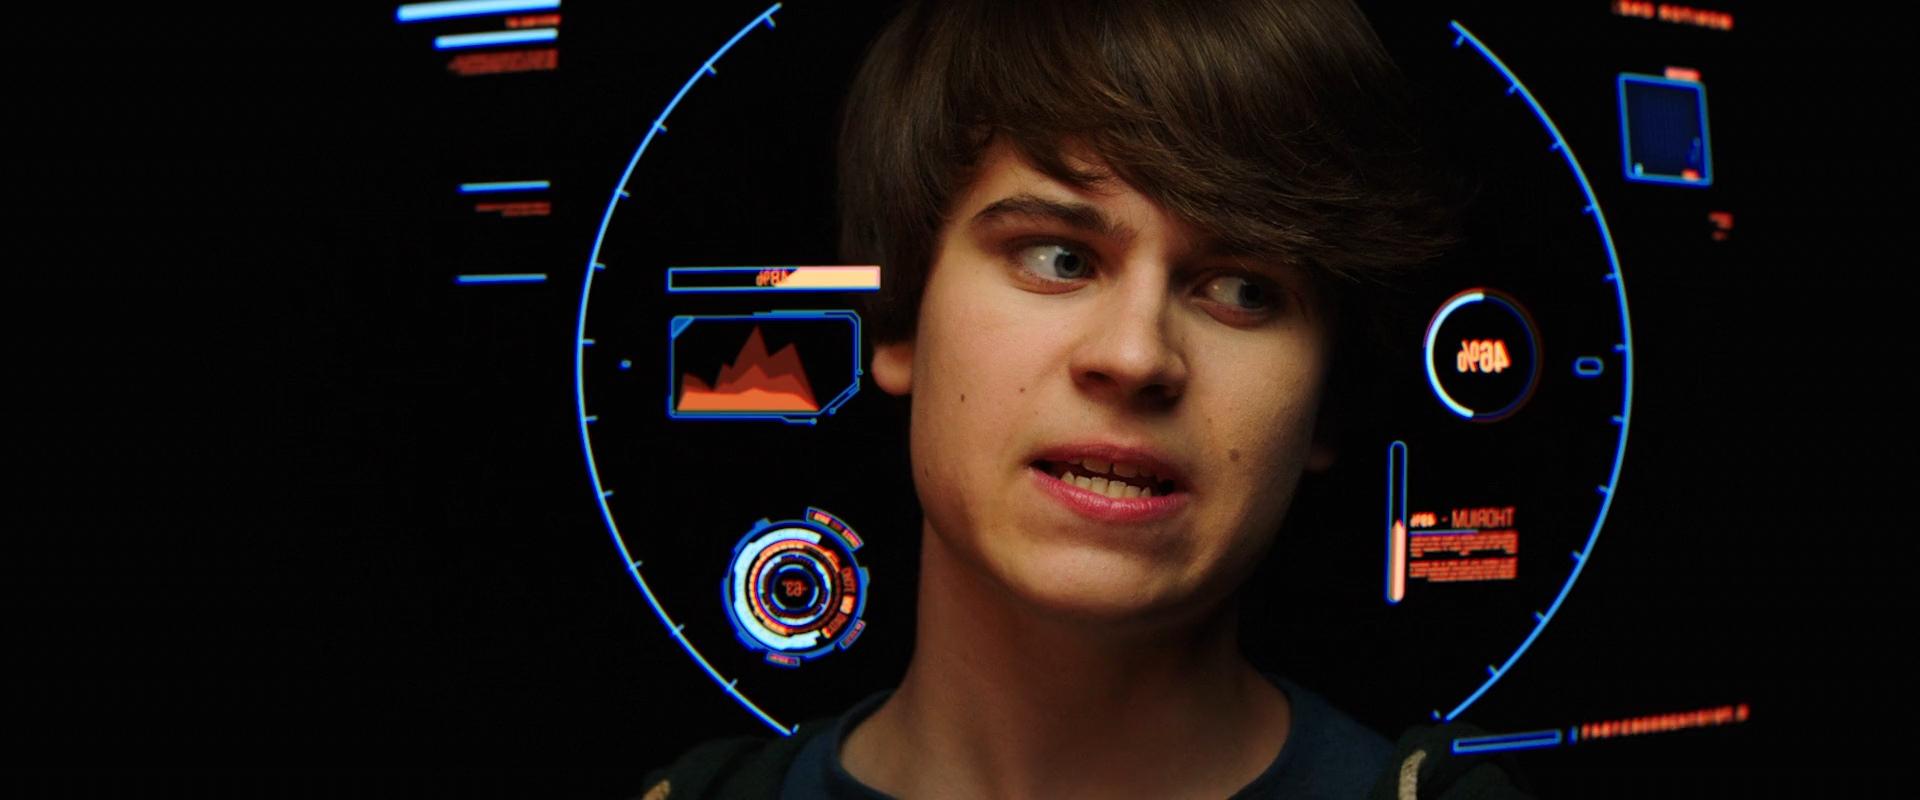 Robot Dostum: ARI'nın Maceraları | 2020 | BDRip | XviD | Türkçe Dublaj | m720p - m1080p | BluRay | Dual | TR-EN | Tek Link